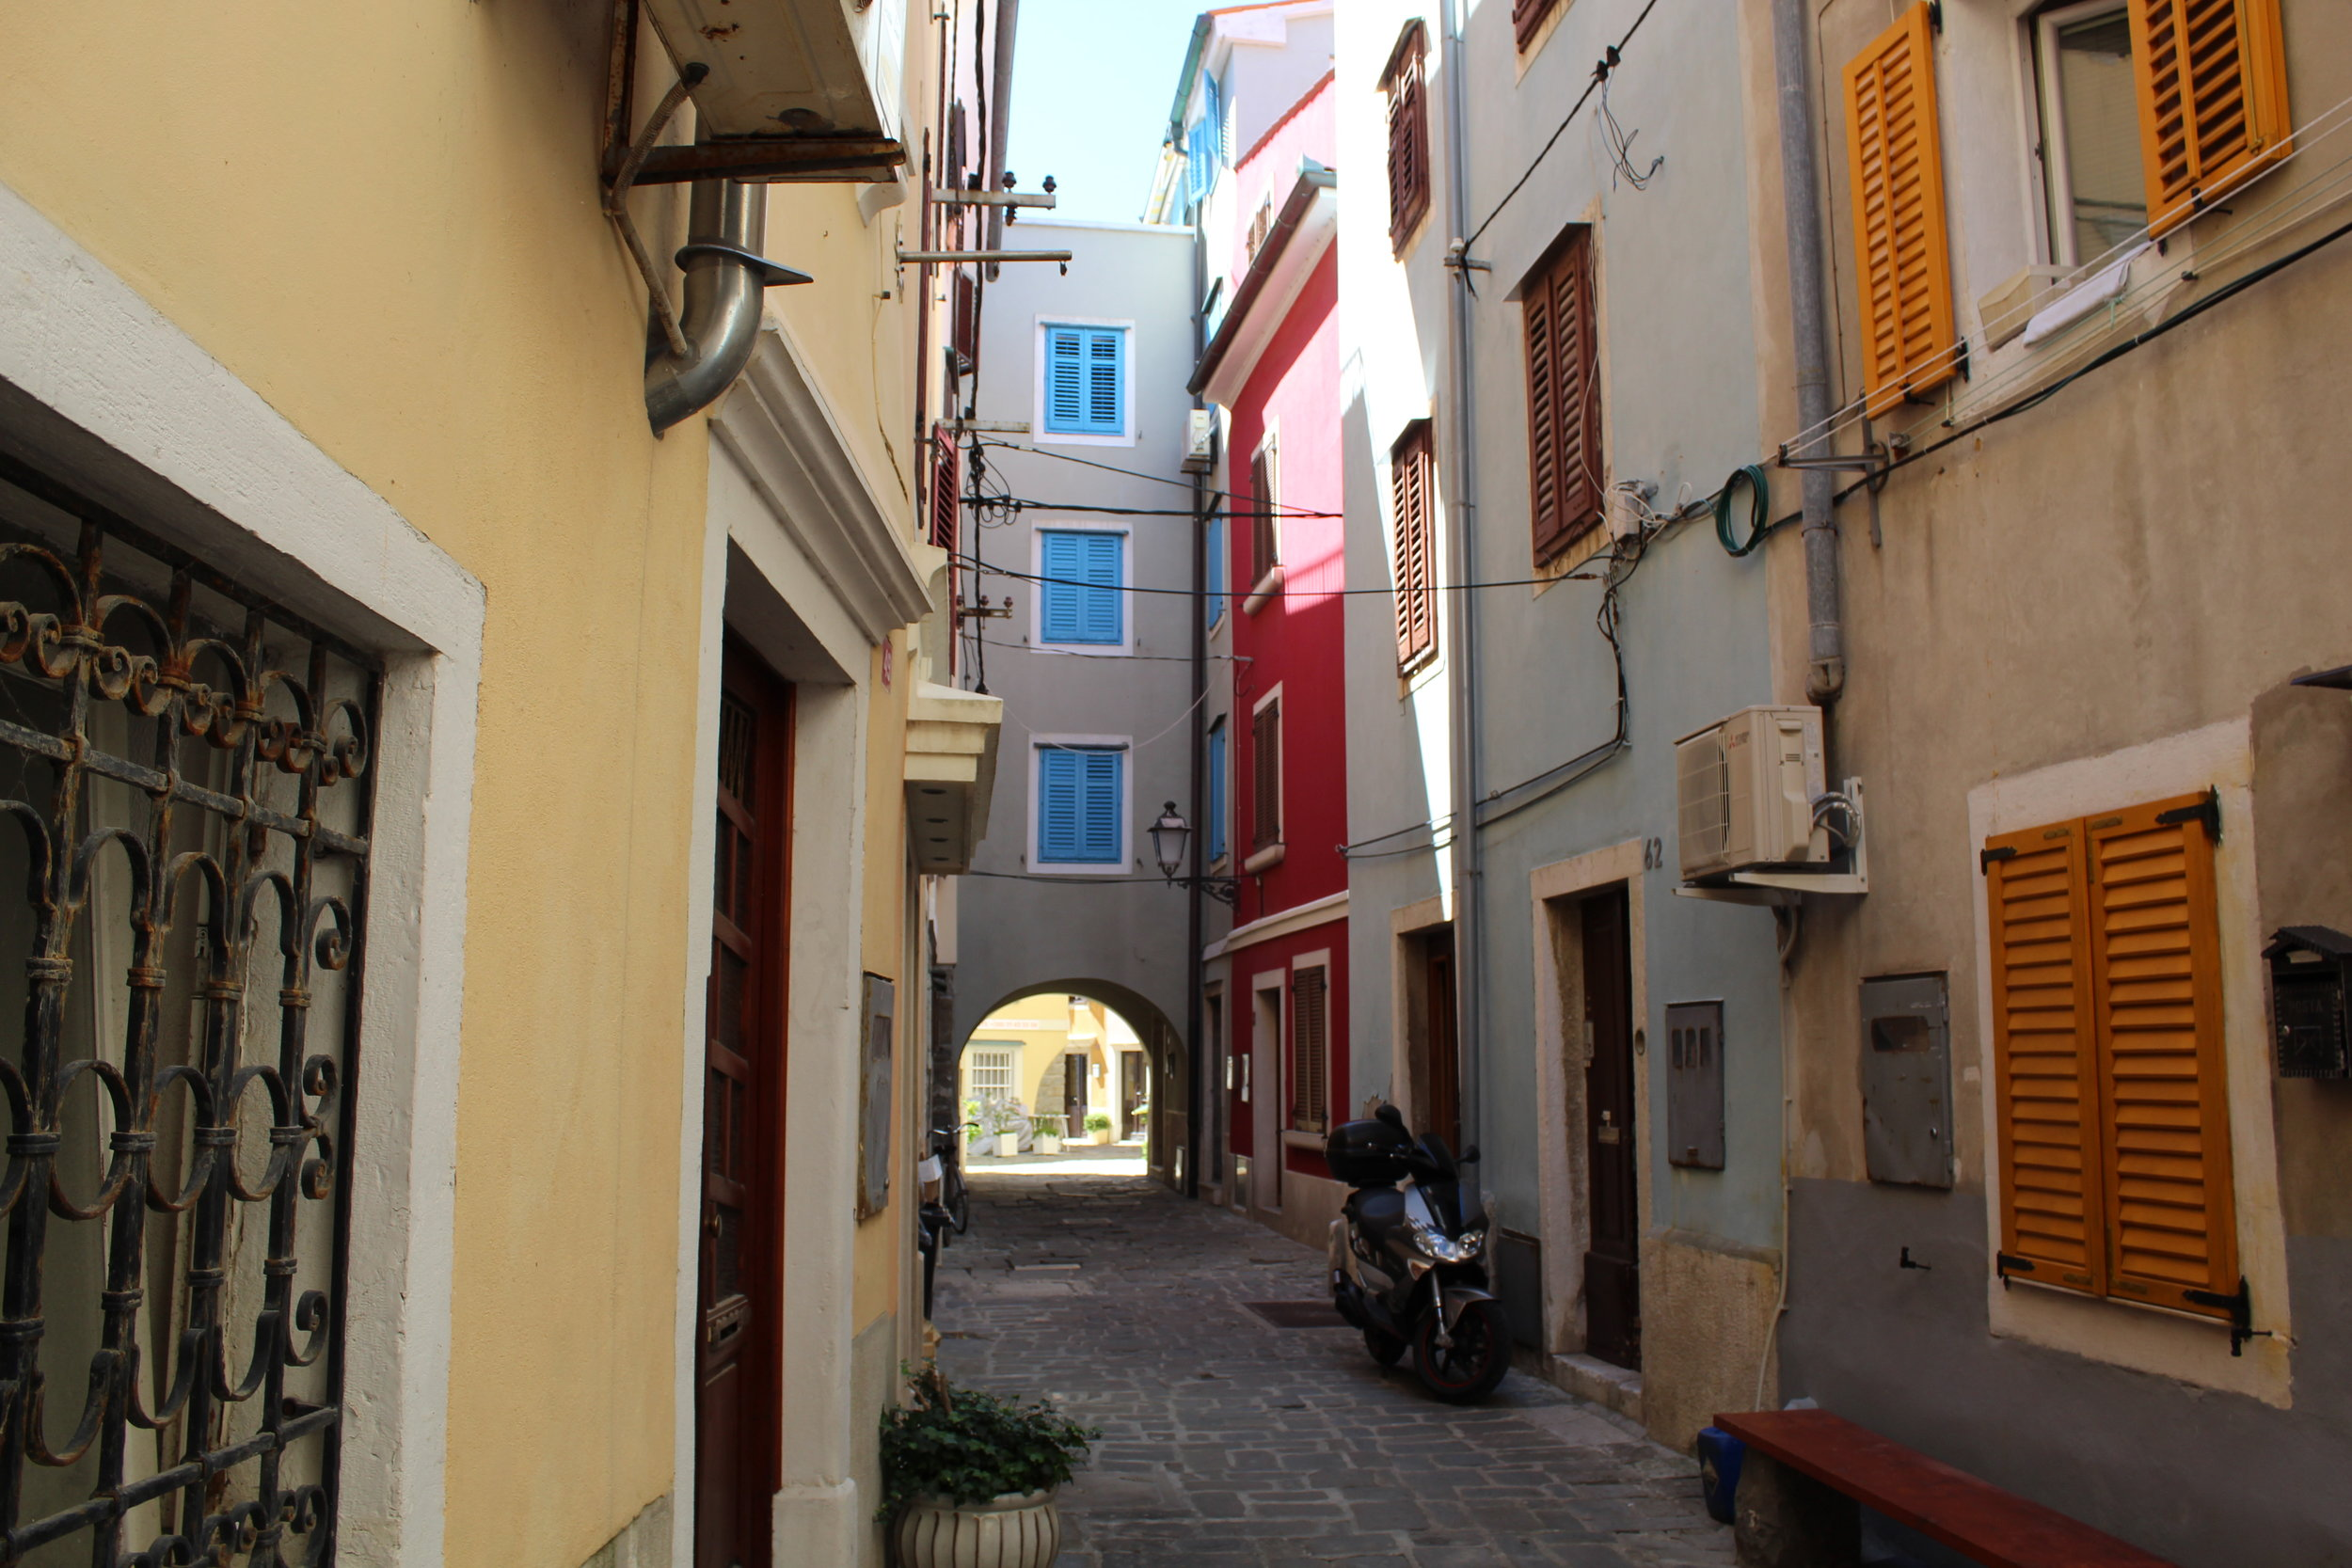 Typical narrow street view through Piram